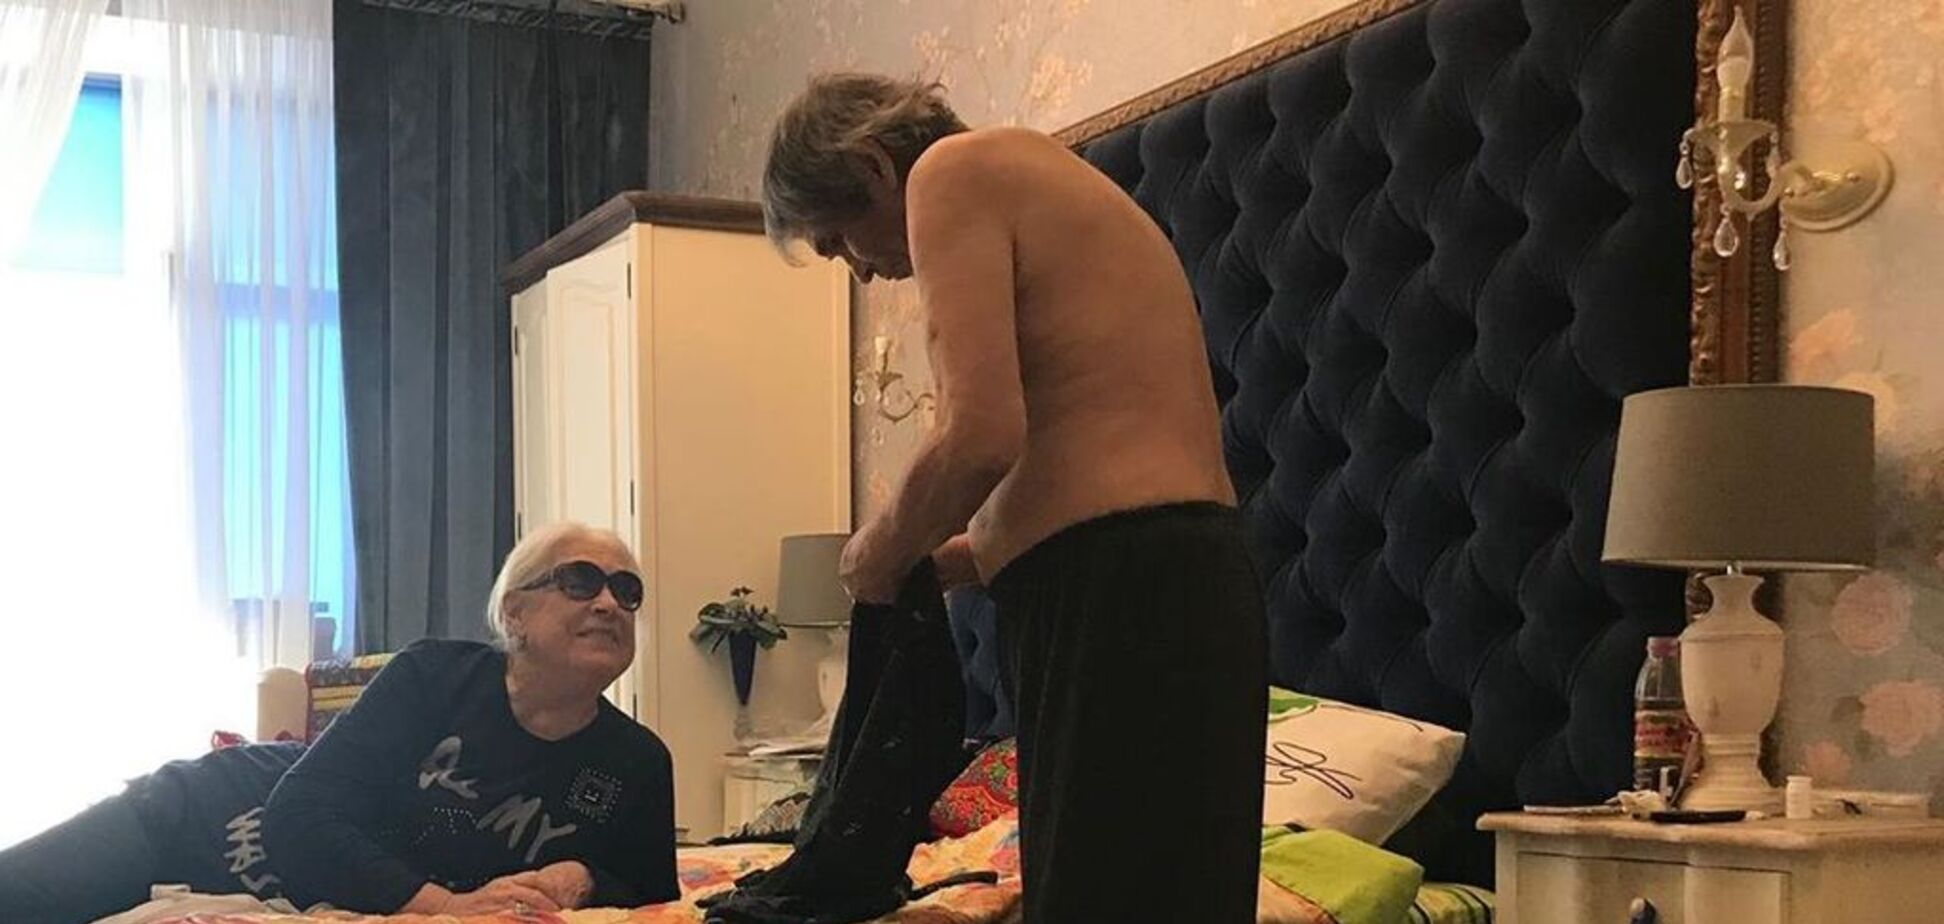 'Кошмар эпилептика': у Алибасова заподозрили проблемы с психикой из-за квартиры